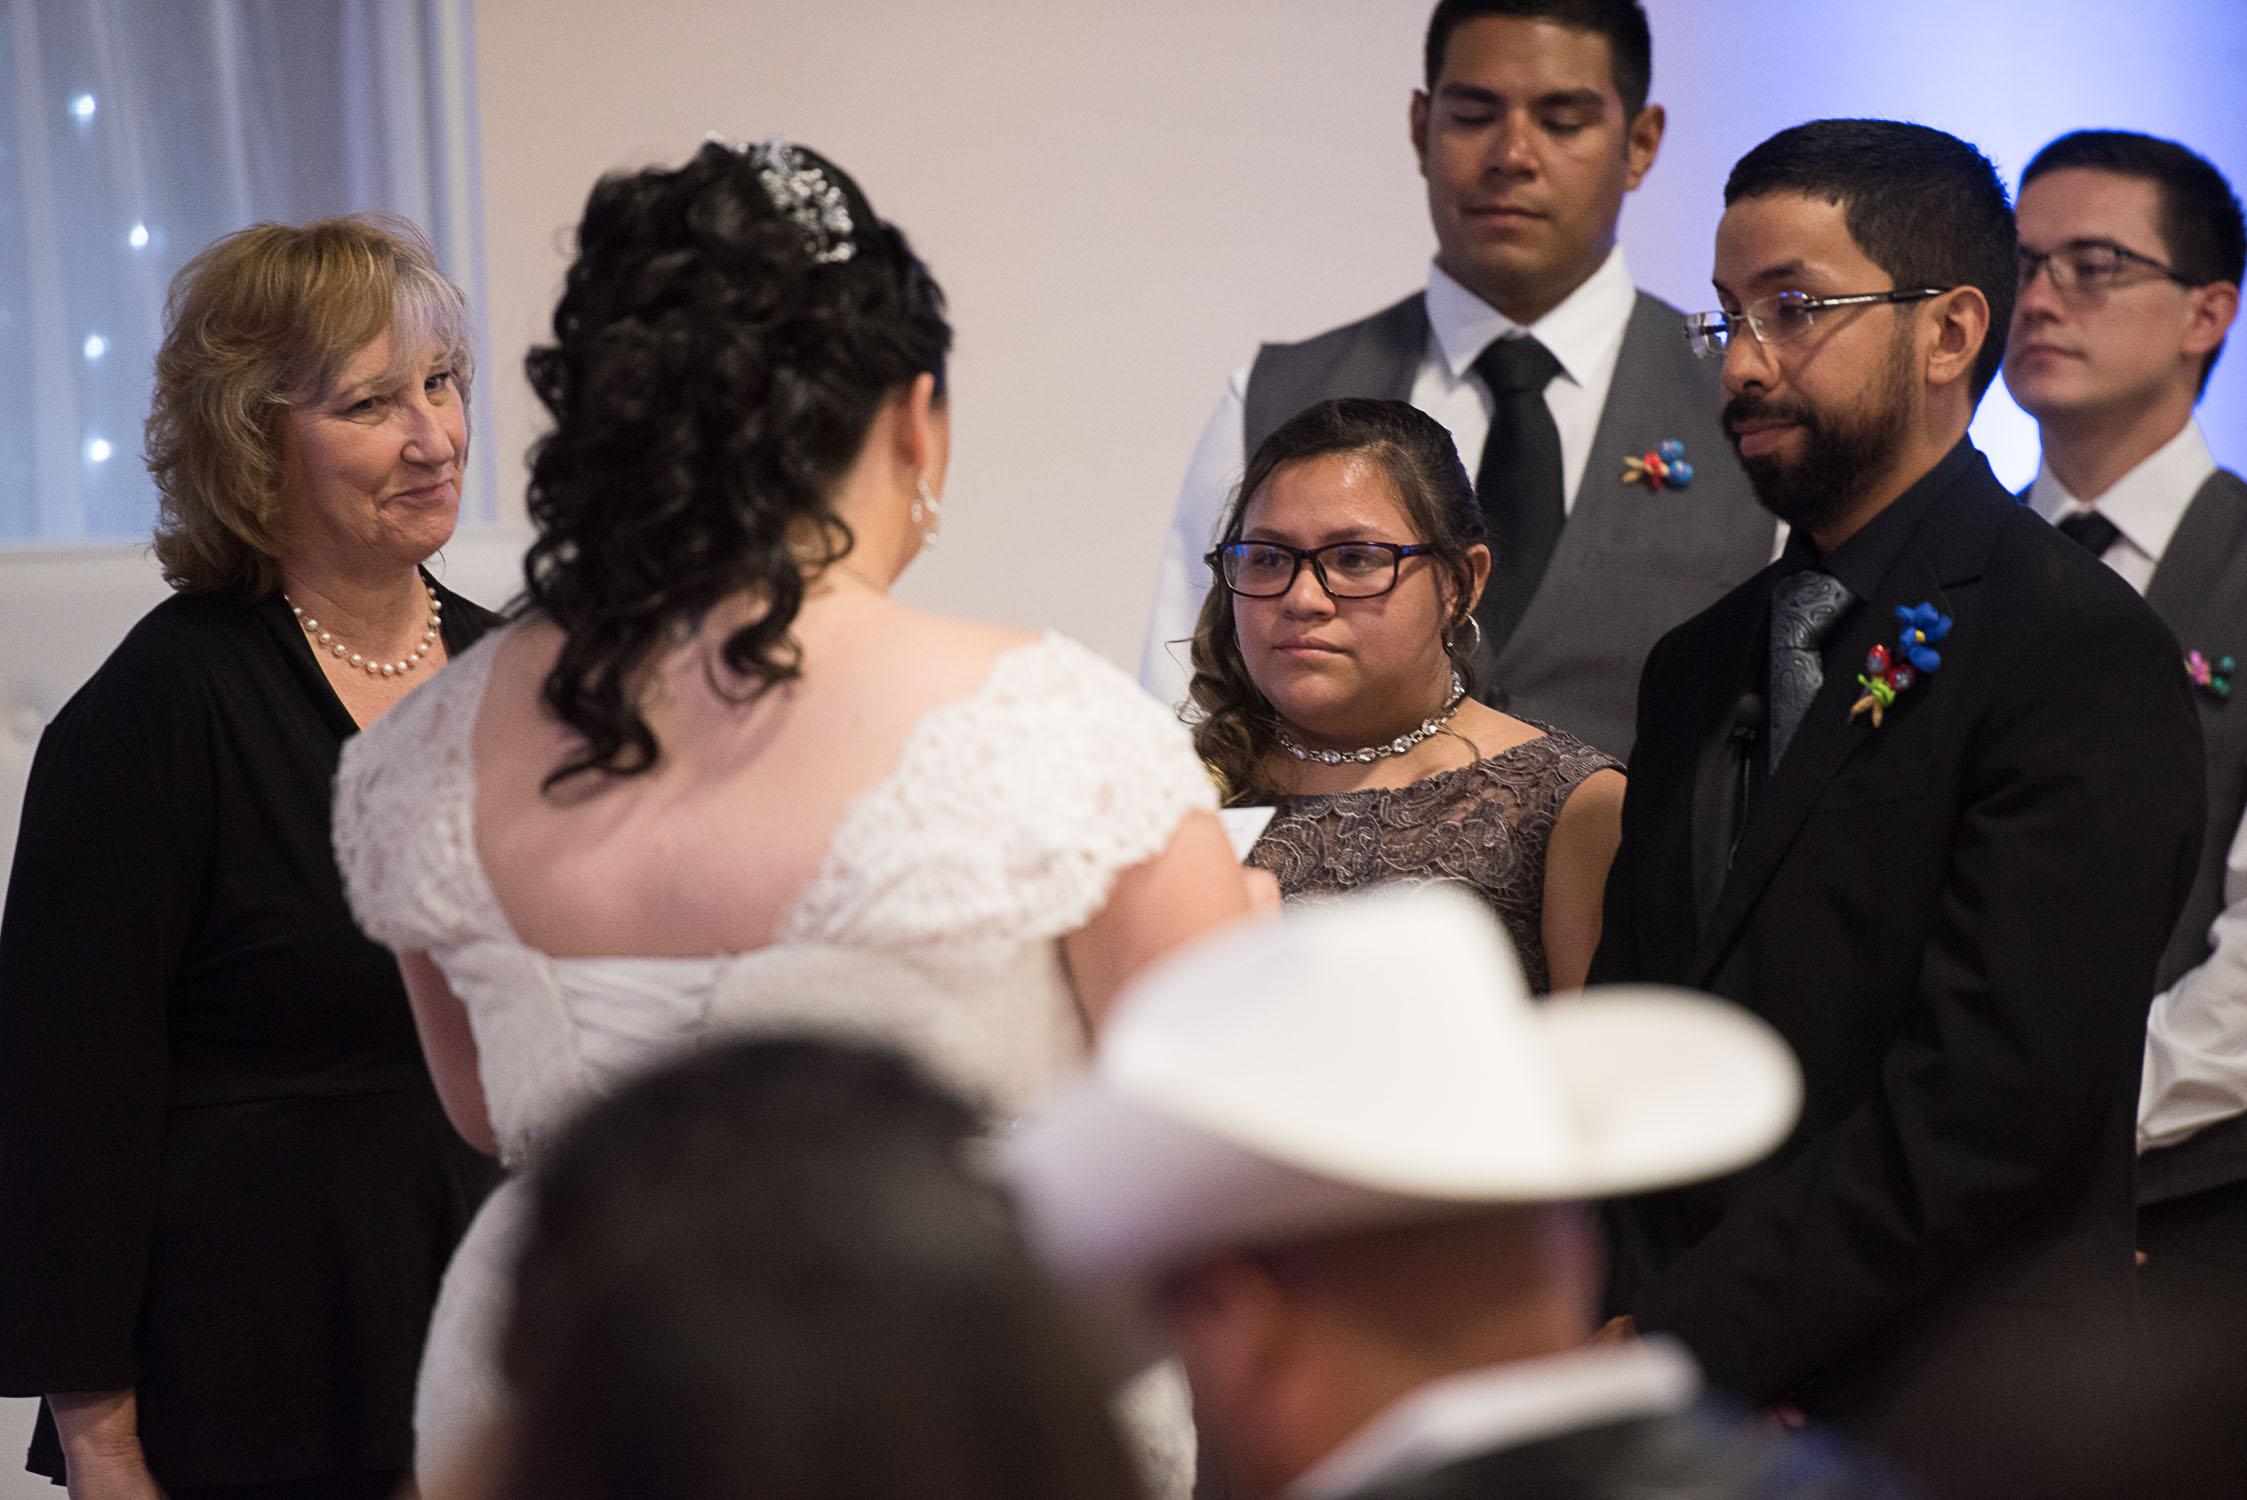 Leal Wedding Mira Visu Photography-118.jpg